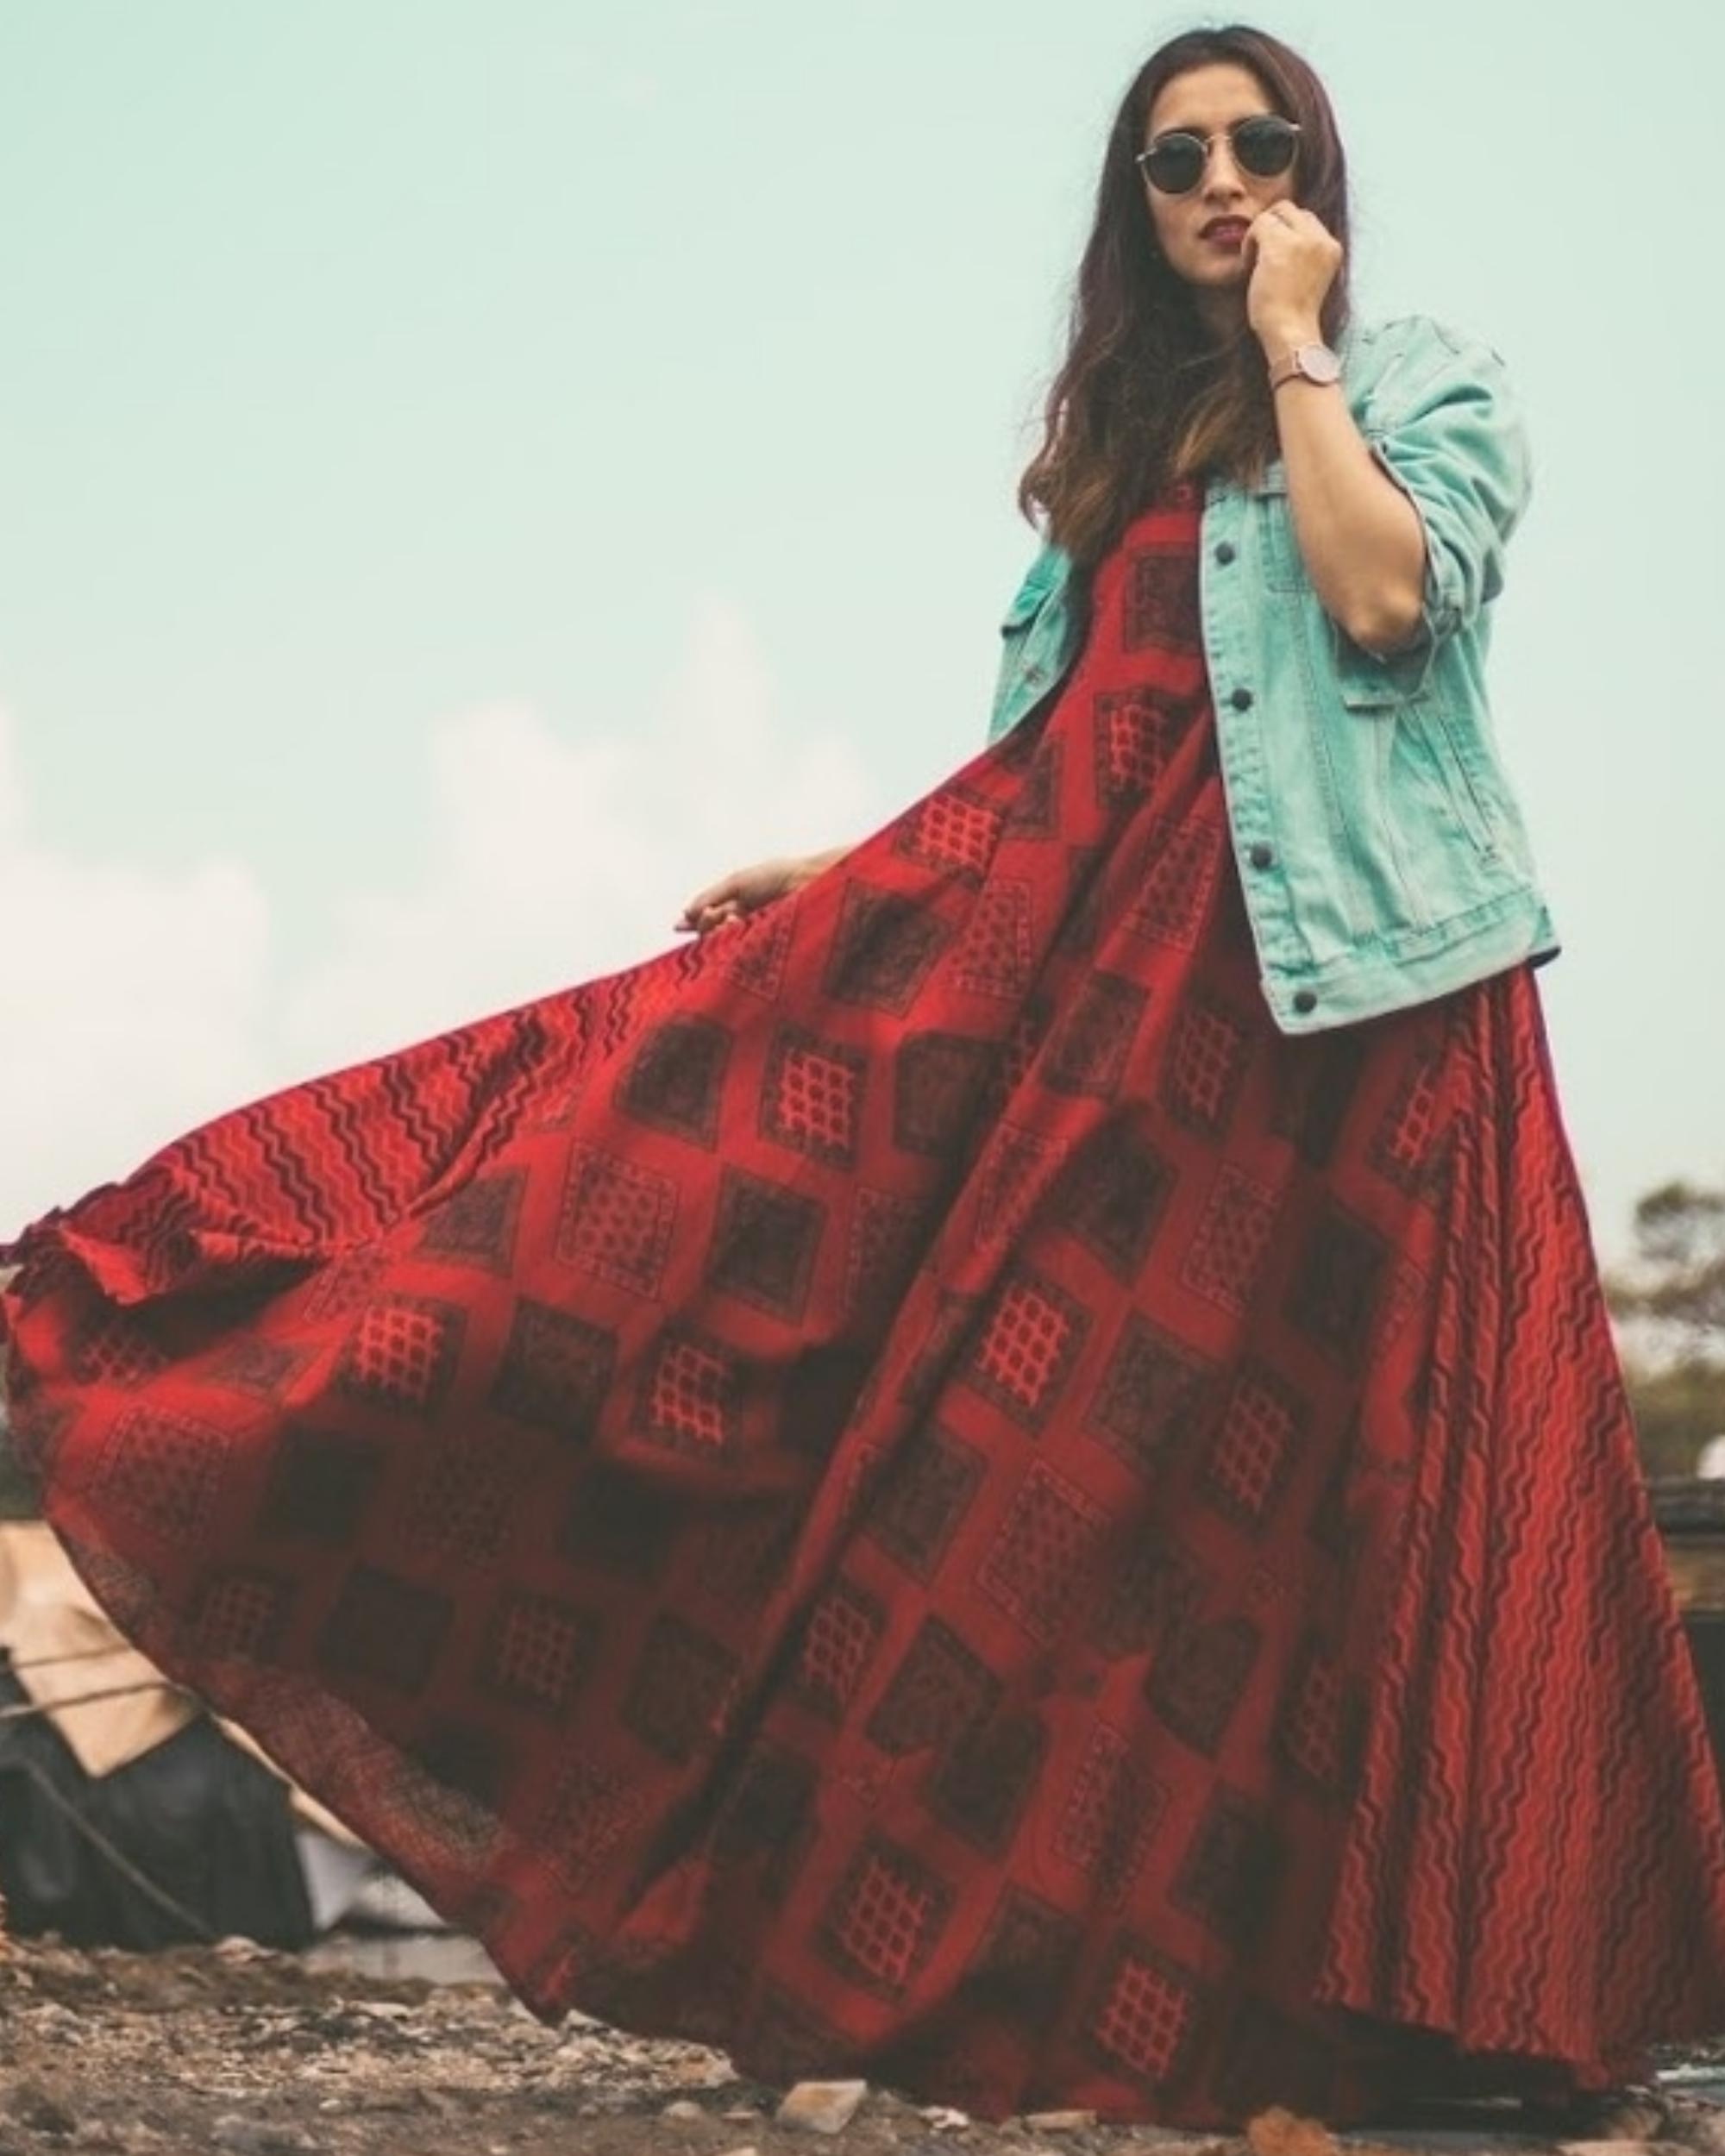 Red Dual Print Dress